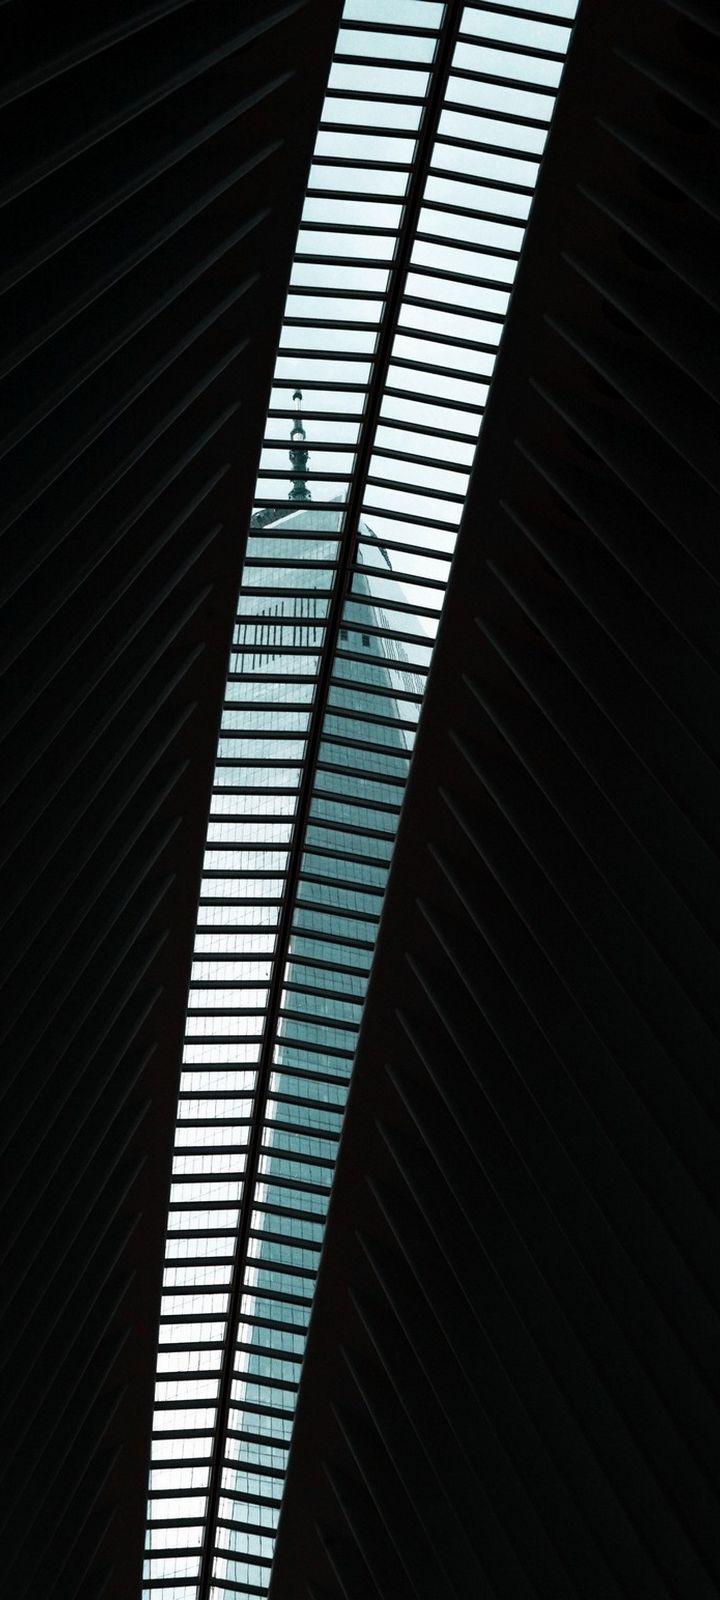 Lattice Ceiling Gap Wallpaper 720x1600